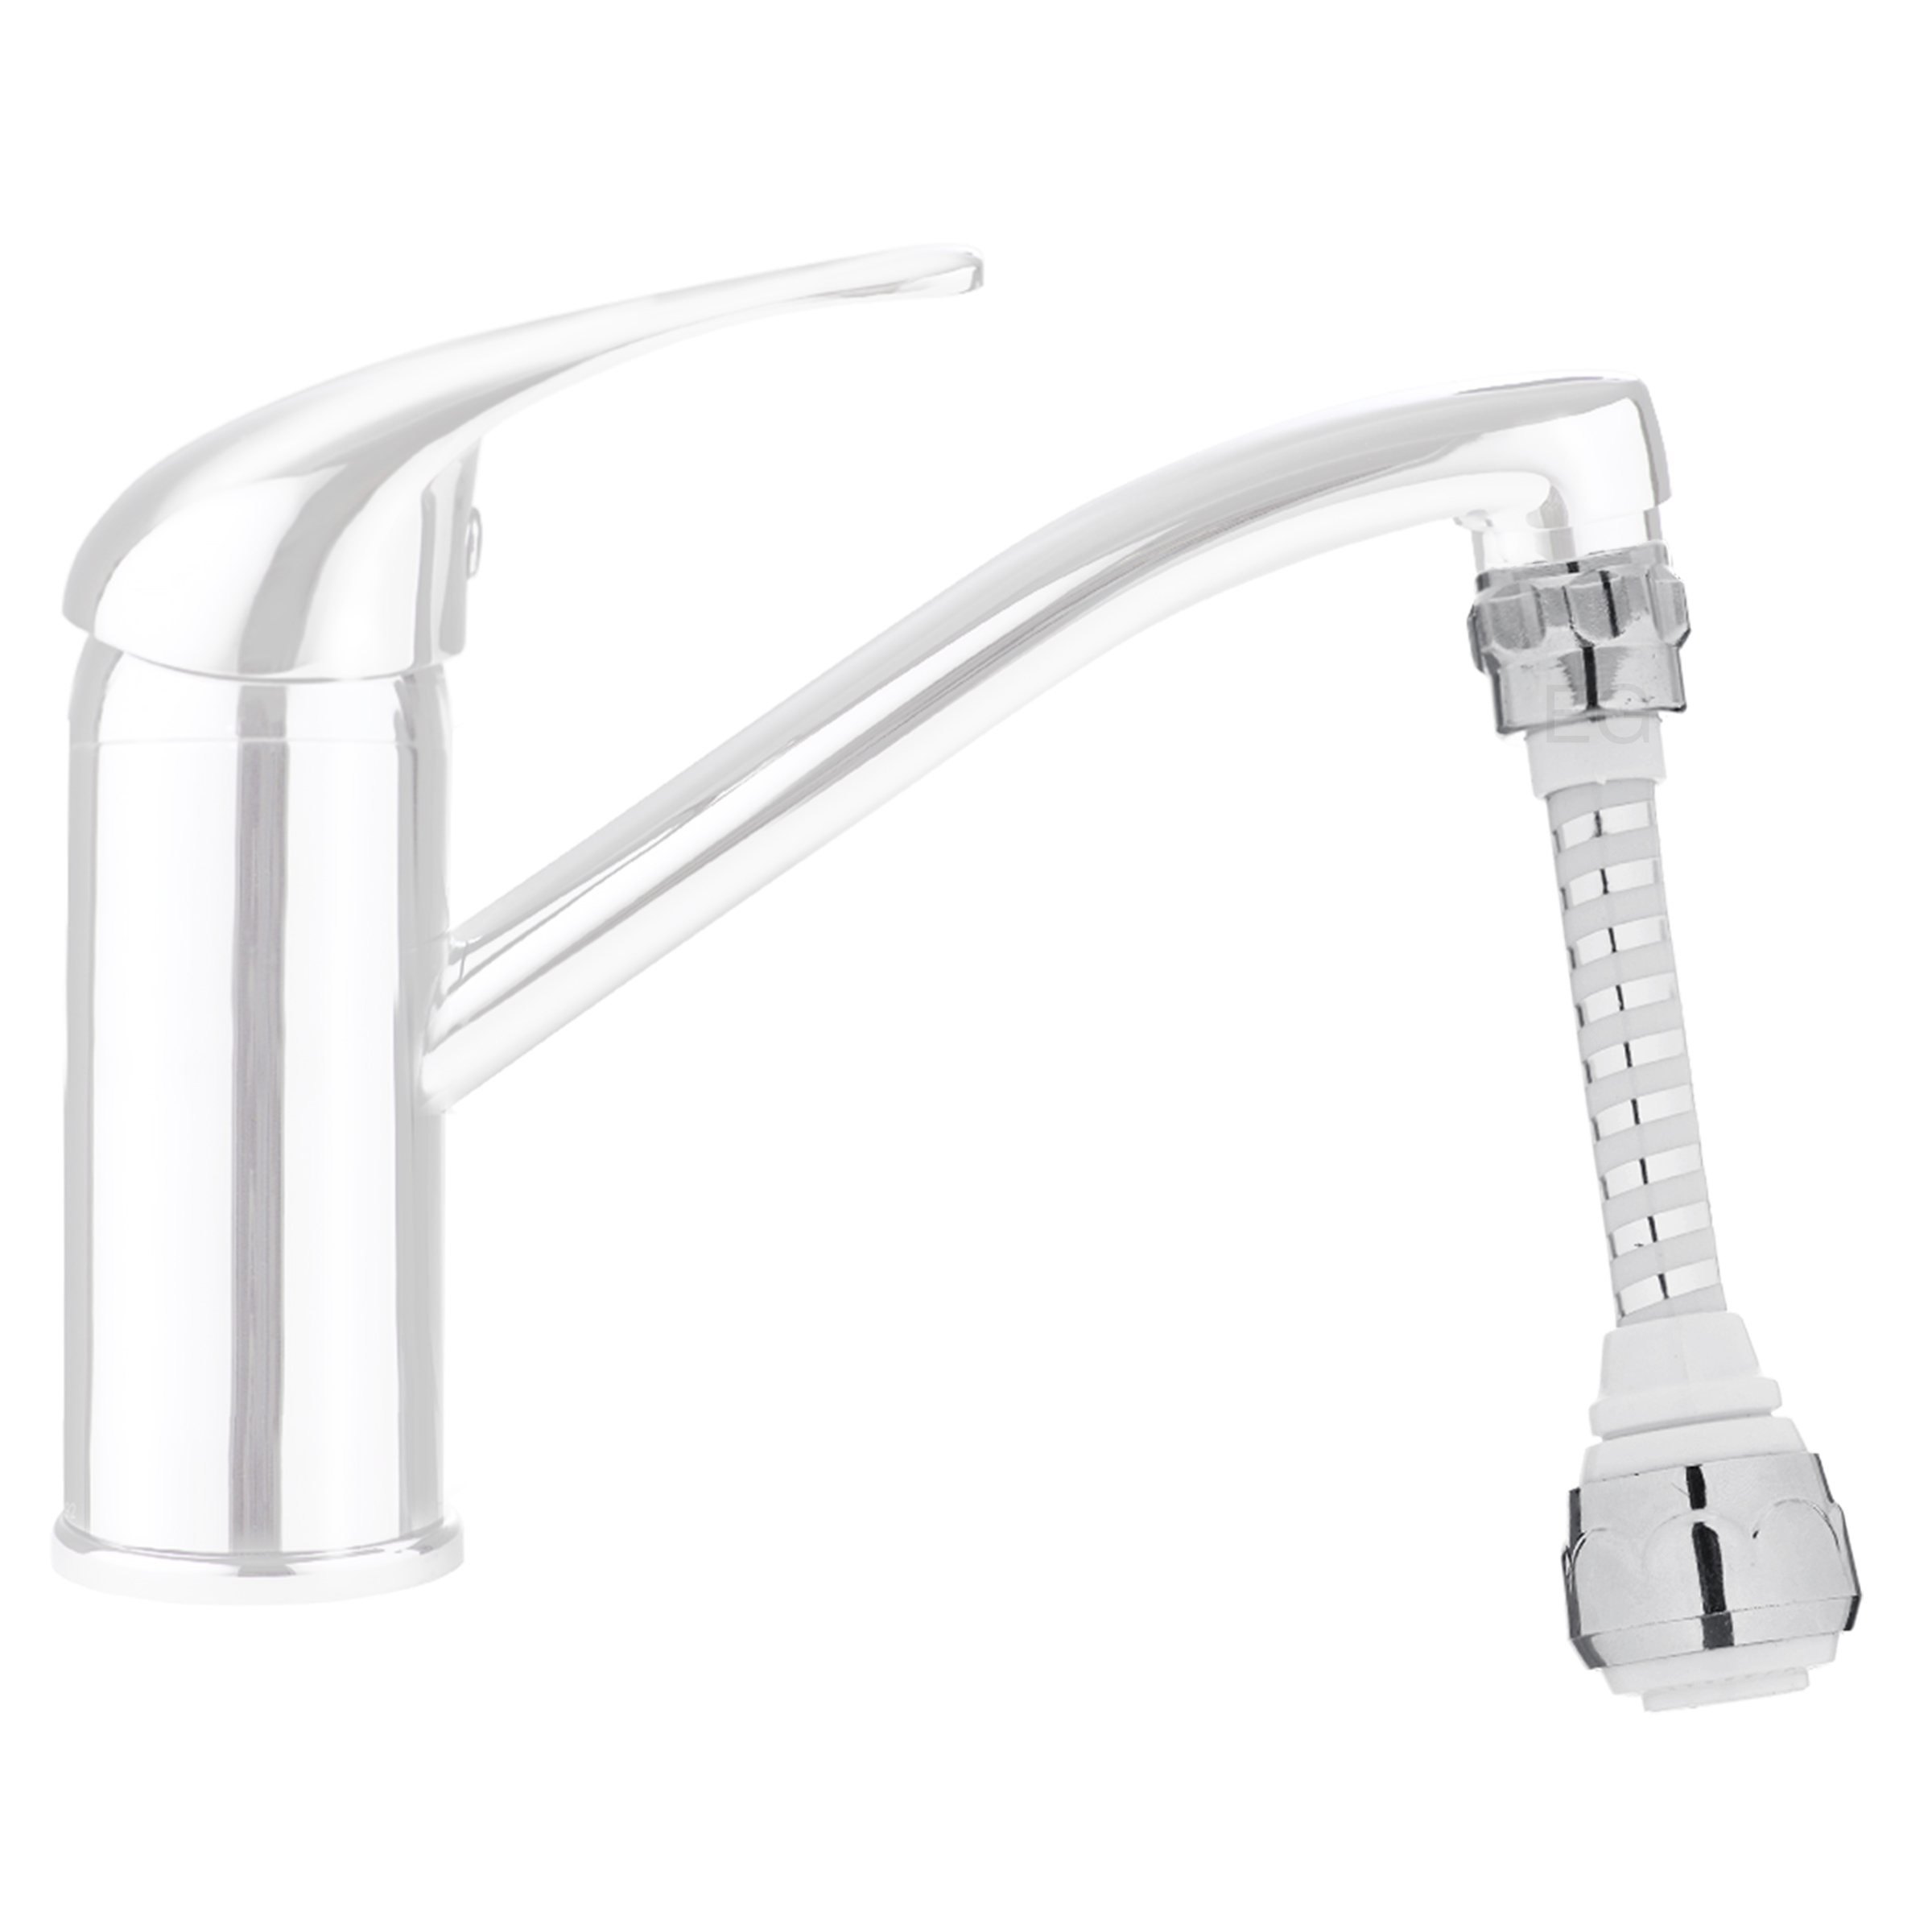 water saving kitchen tap aerator hose adjustable faucet adapter item specifics